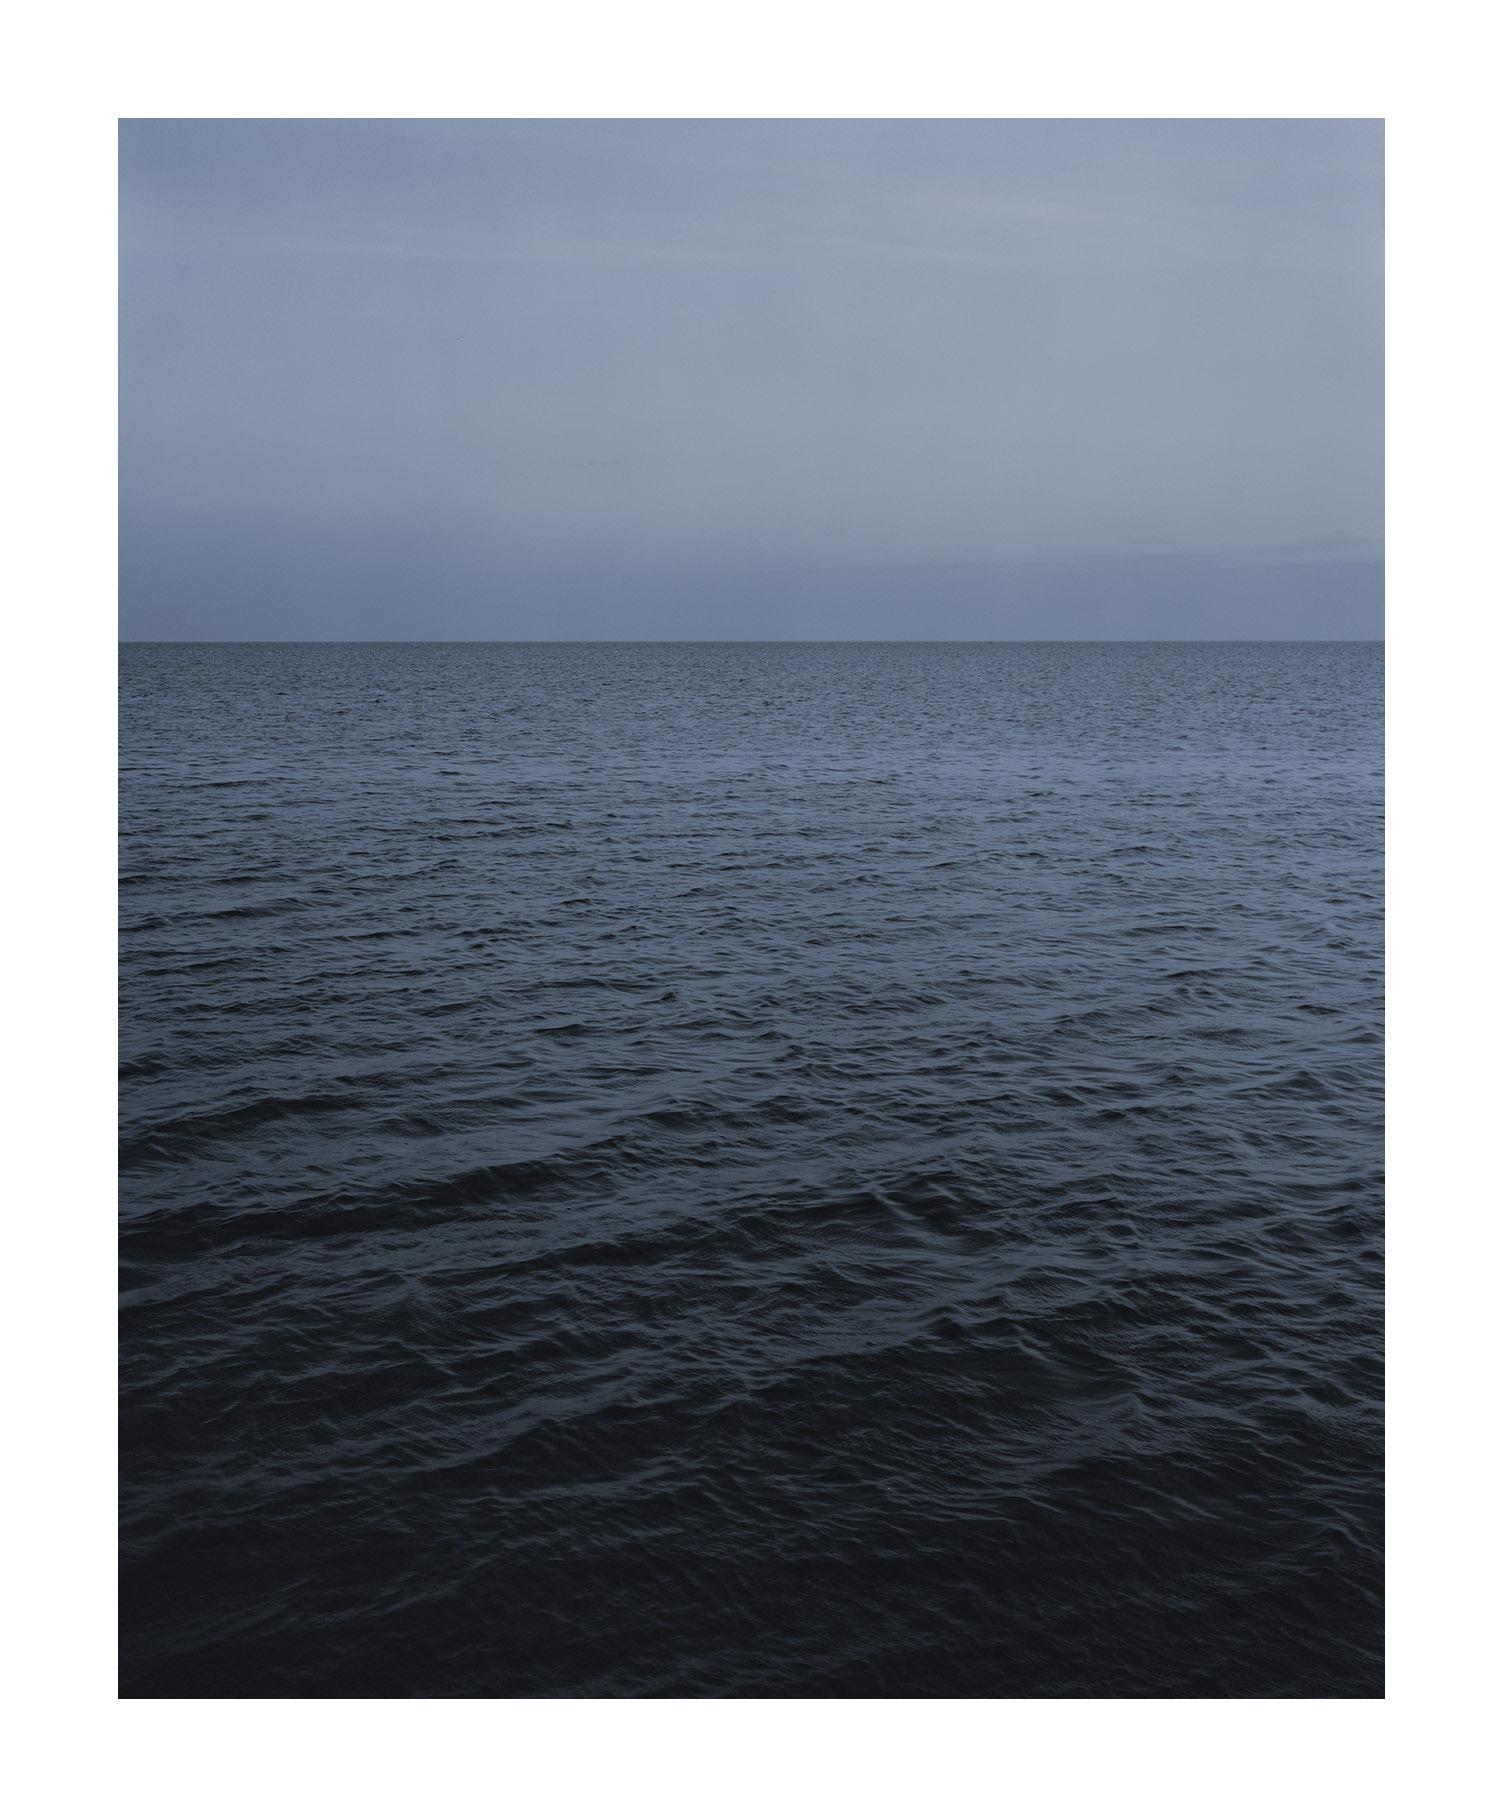 19_front.jpg